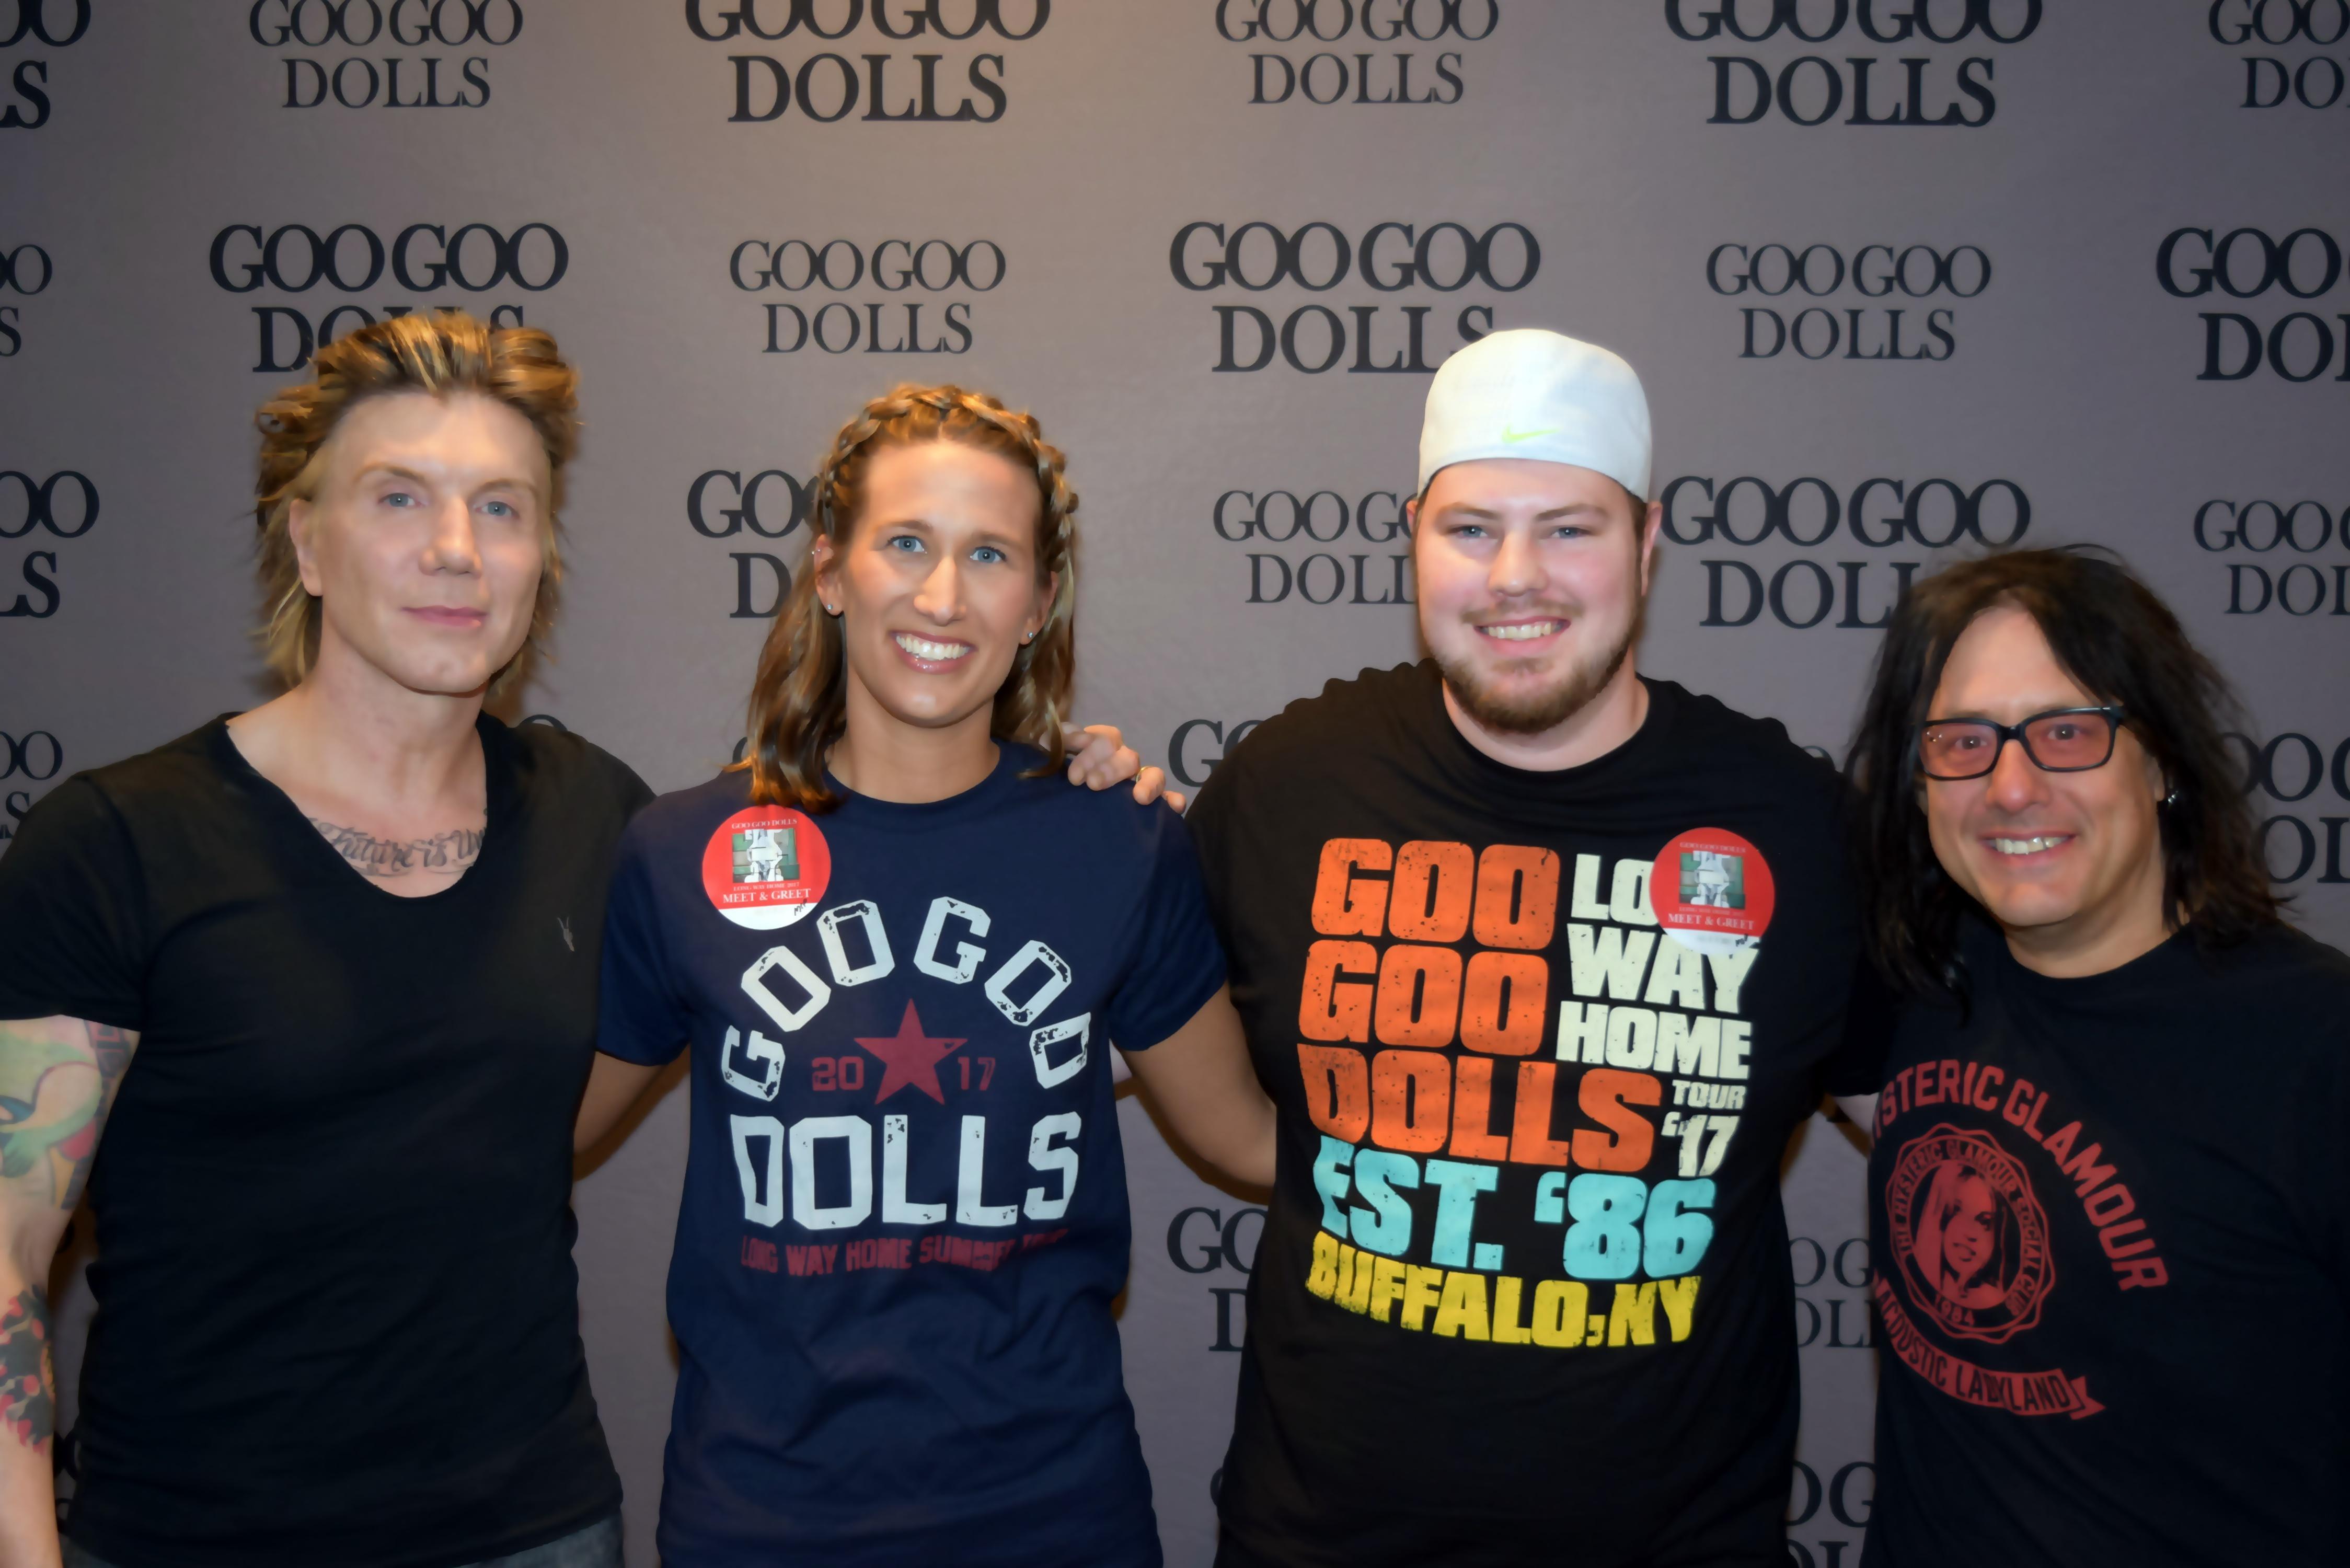 Photos Goo Goo Dolls Meet Greet Shots From The Wixx 40th